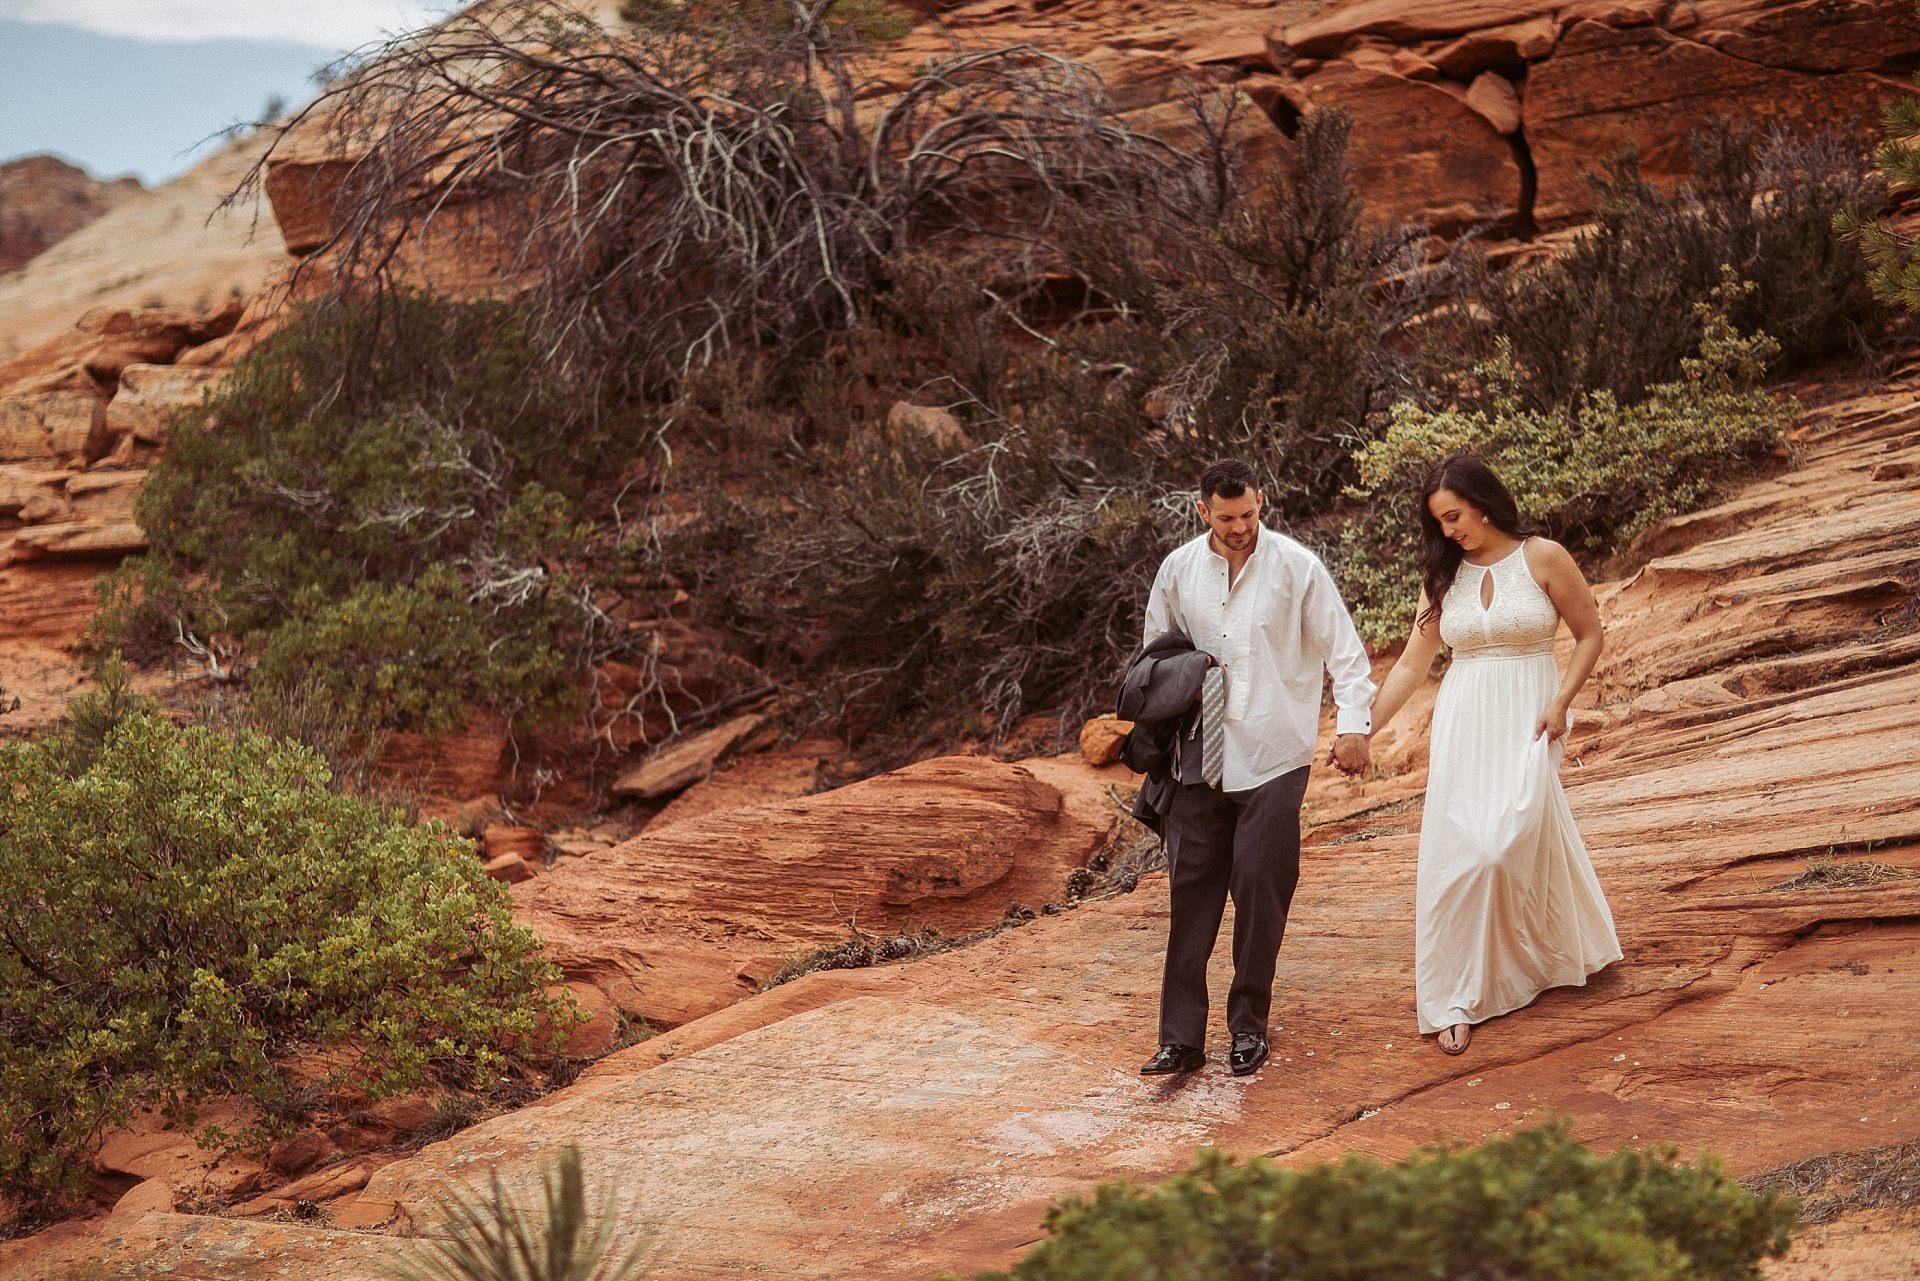 Hicks-Zion-National-Park-Wedding-0016.jpg